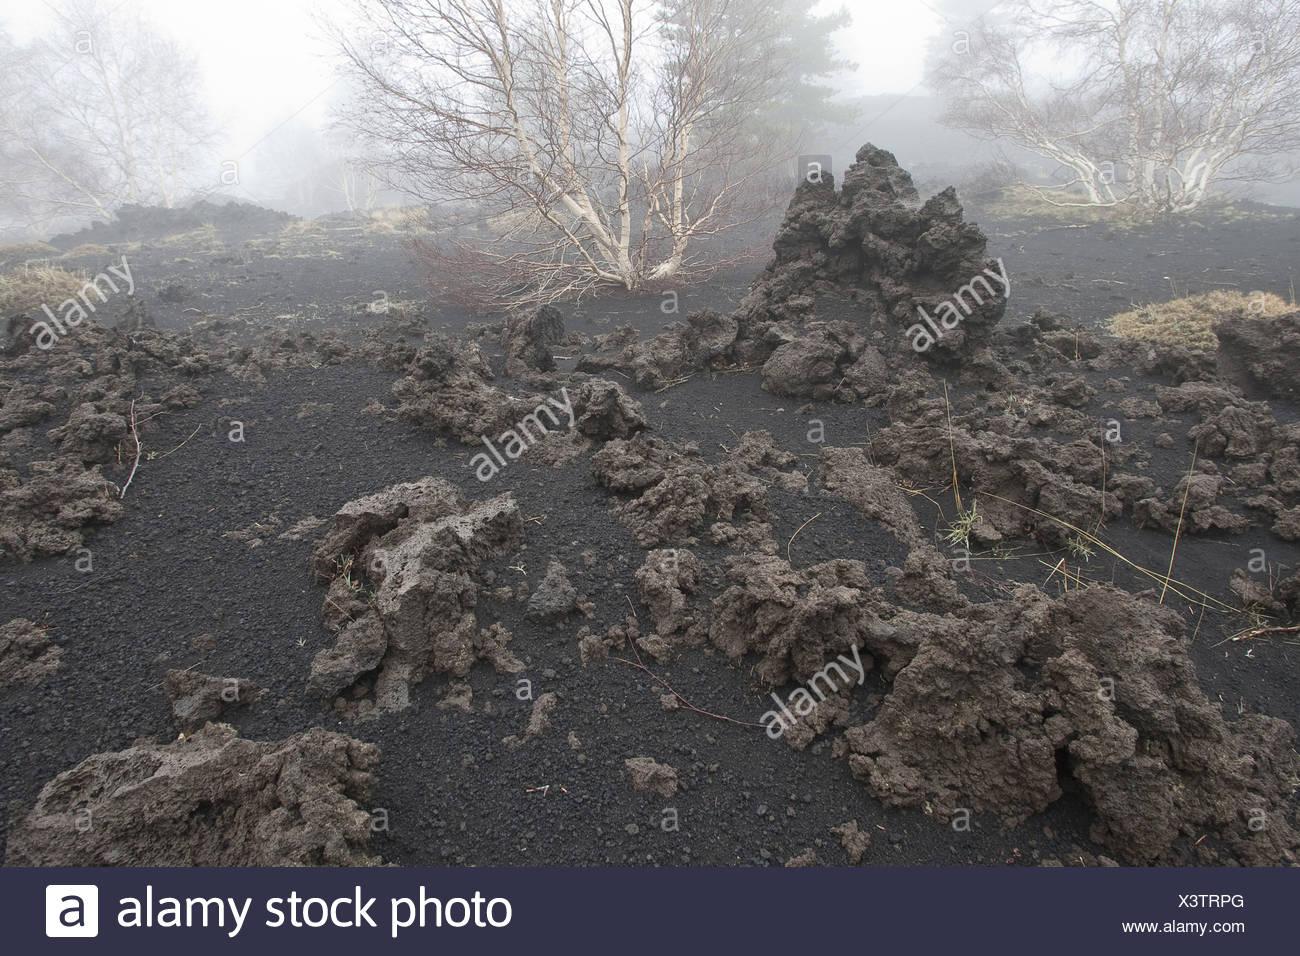 Etna birch, White Birch (Betula aetnensis, Betula pendula ssp. aetnensis), lava at Mount Etna, Italy, Sicilia - Stock Image